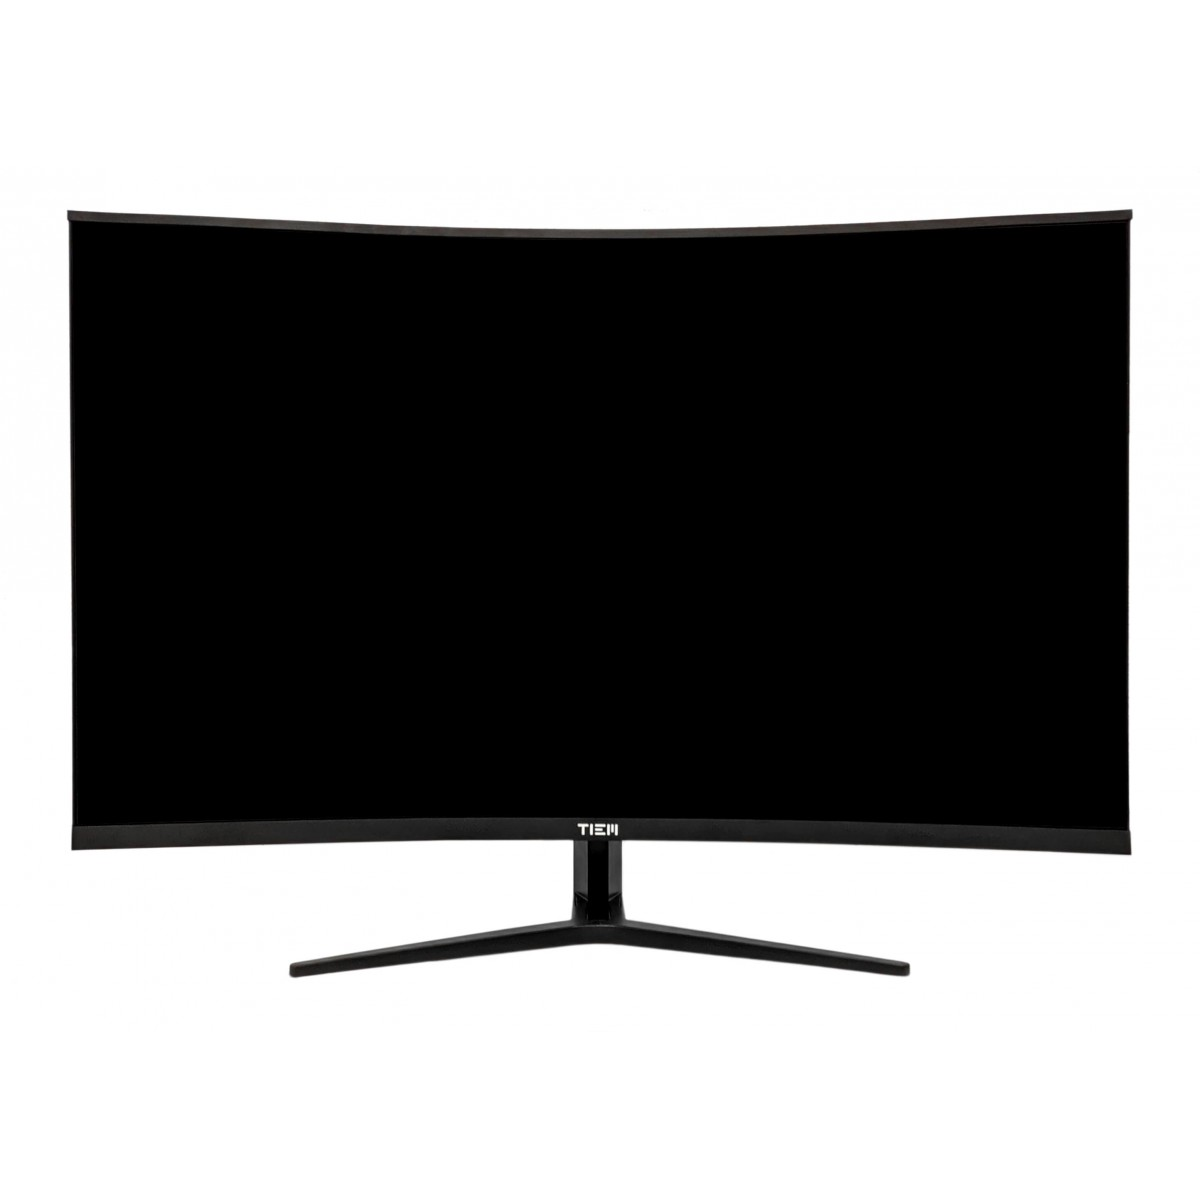 Monitor Gamer TIEM, 32 Pol, Full HD, Curvo, 1ms, 165Hz, HDMI/DP/DVI, C32FSP